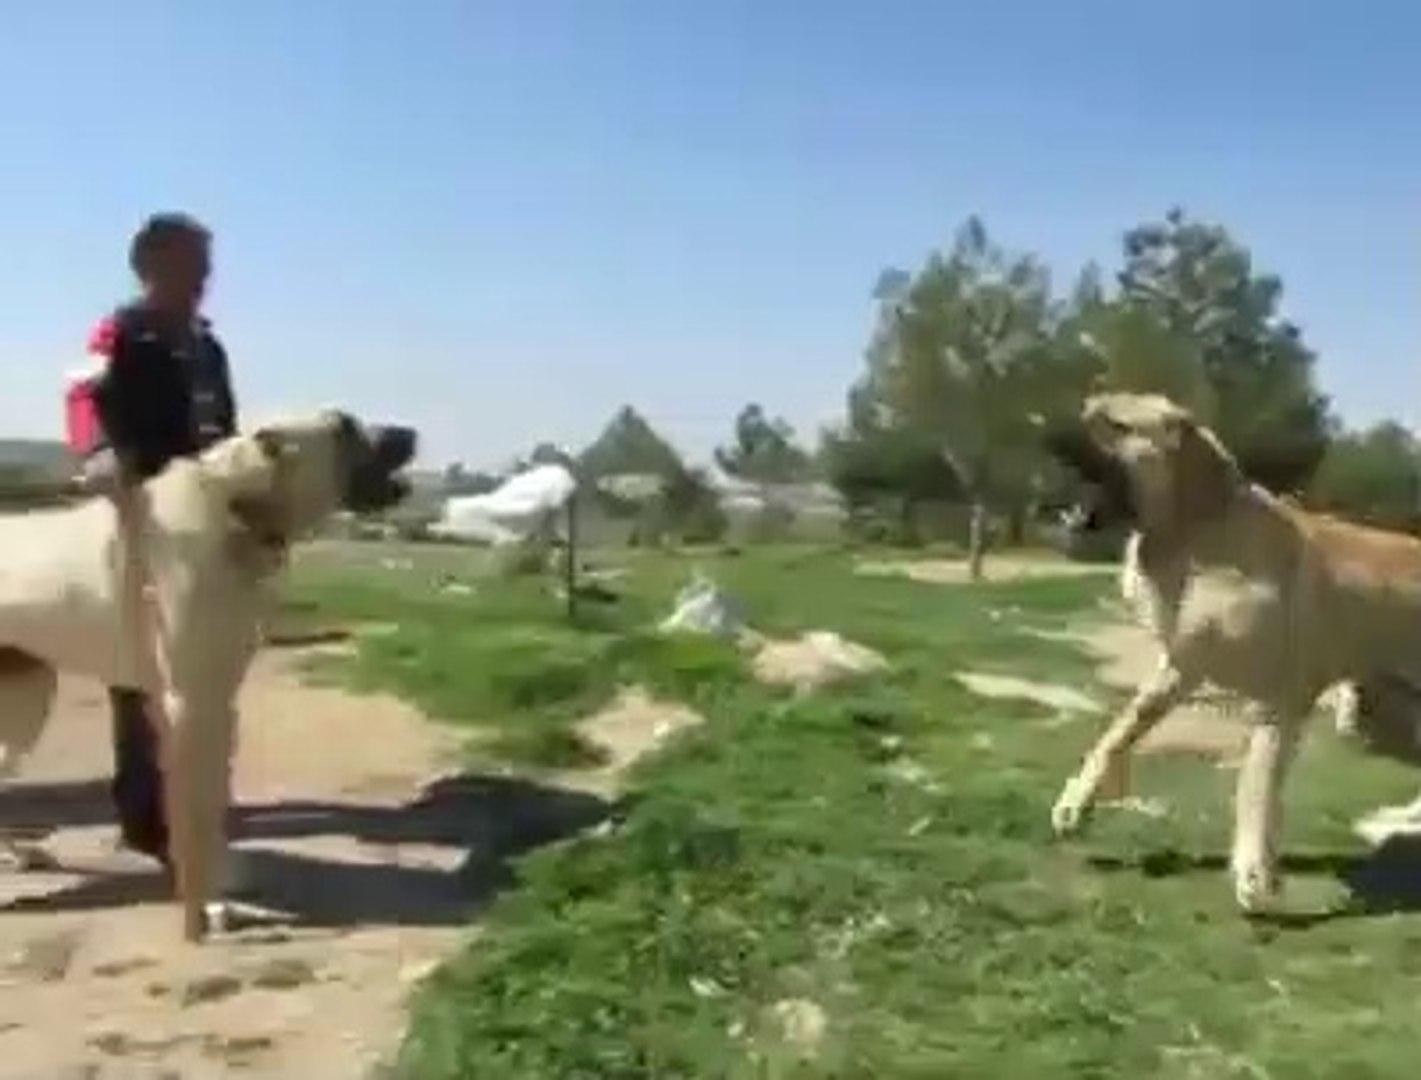 90+ LAR KARSI KARSIYA GELIRSE - 90+  SHEPHERD DOGS FACE TO FACE